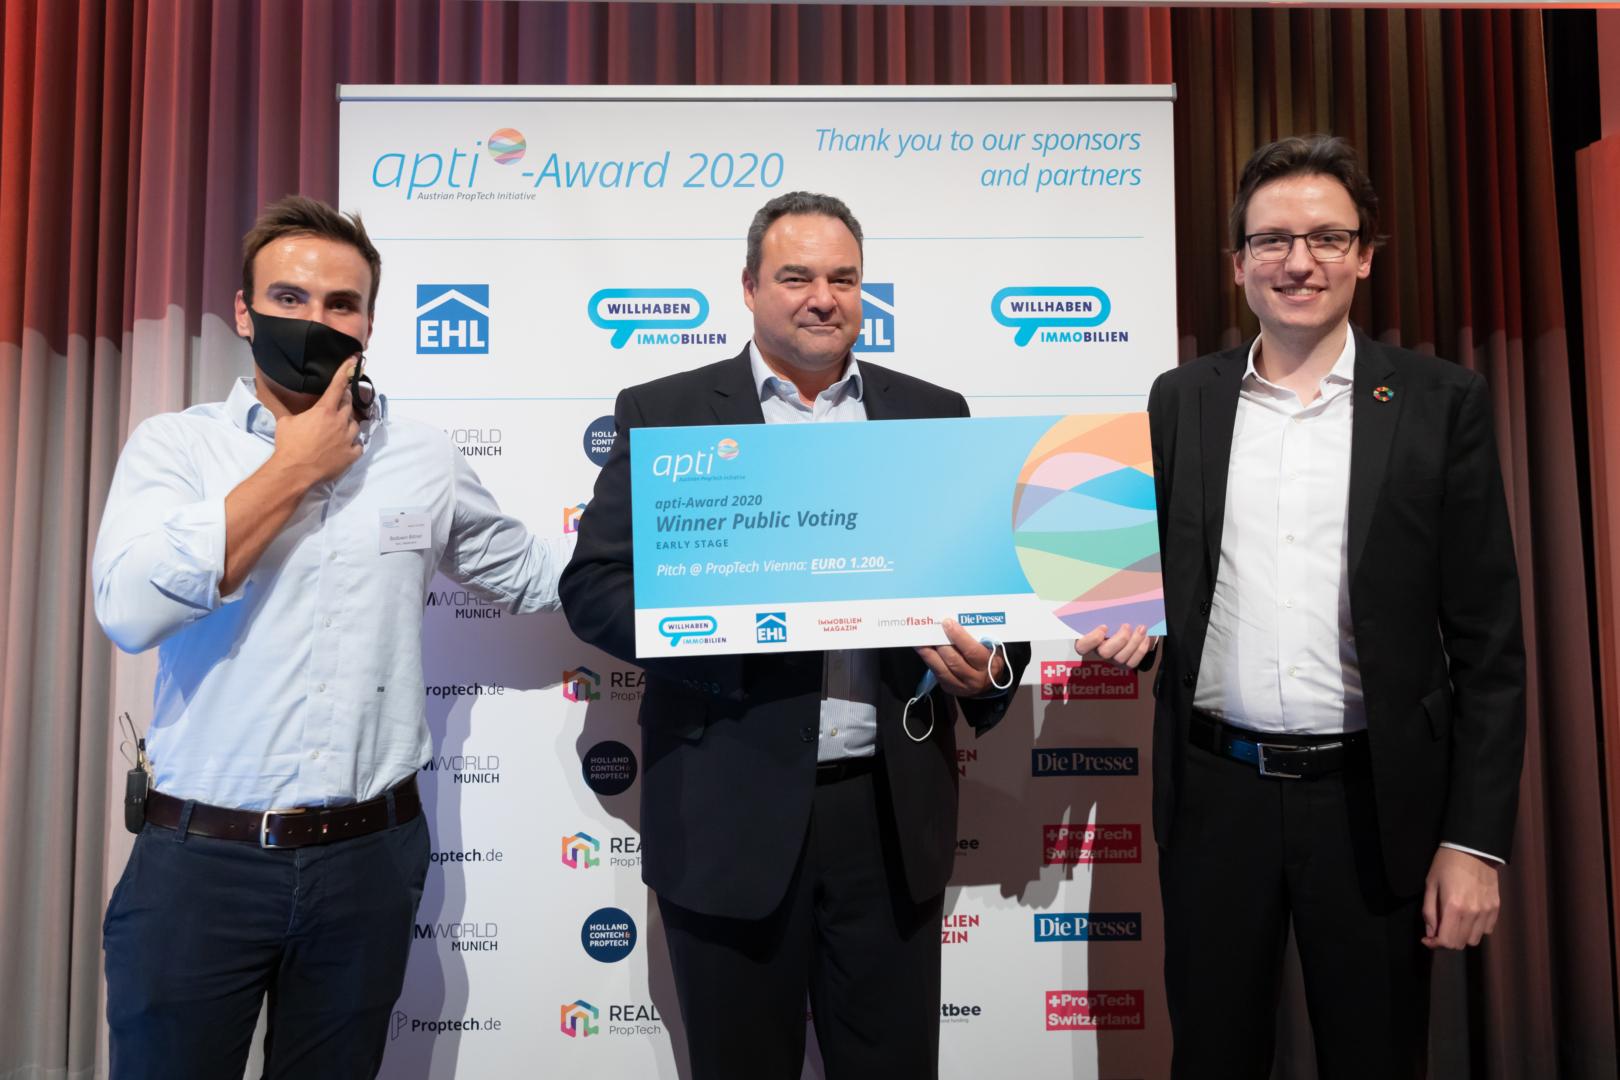 Breeze Technologies erhält den Publikumspreis bei der jährlichen apti-Award-Gala.